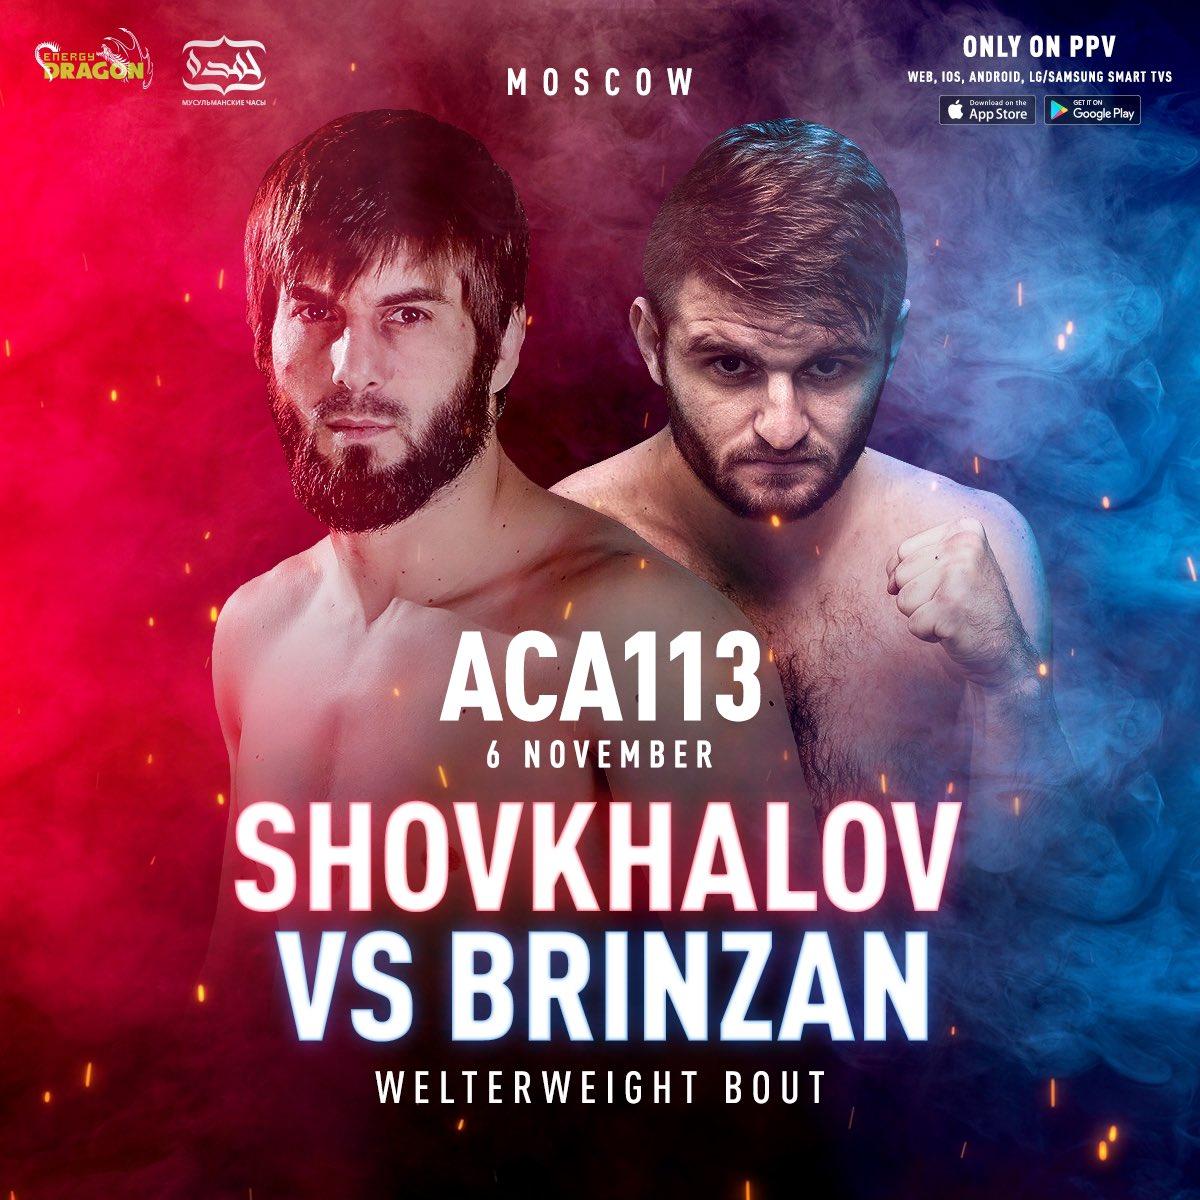 🔥 Welterweight fight: Rasul Shovhalov vs. Cristian Brînzan on ACA 113. https://t.co/ULNDfl4daI